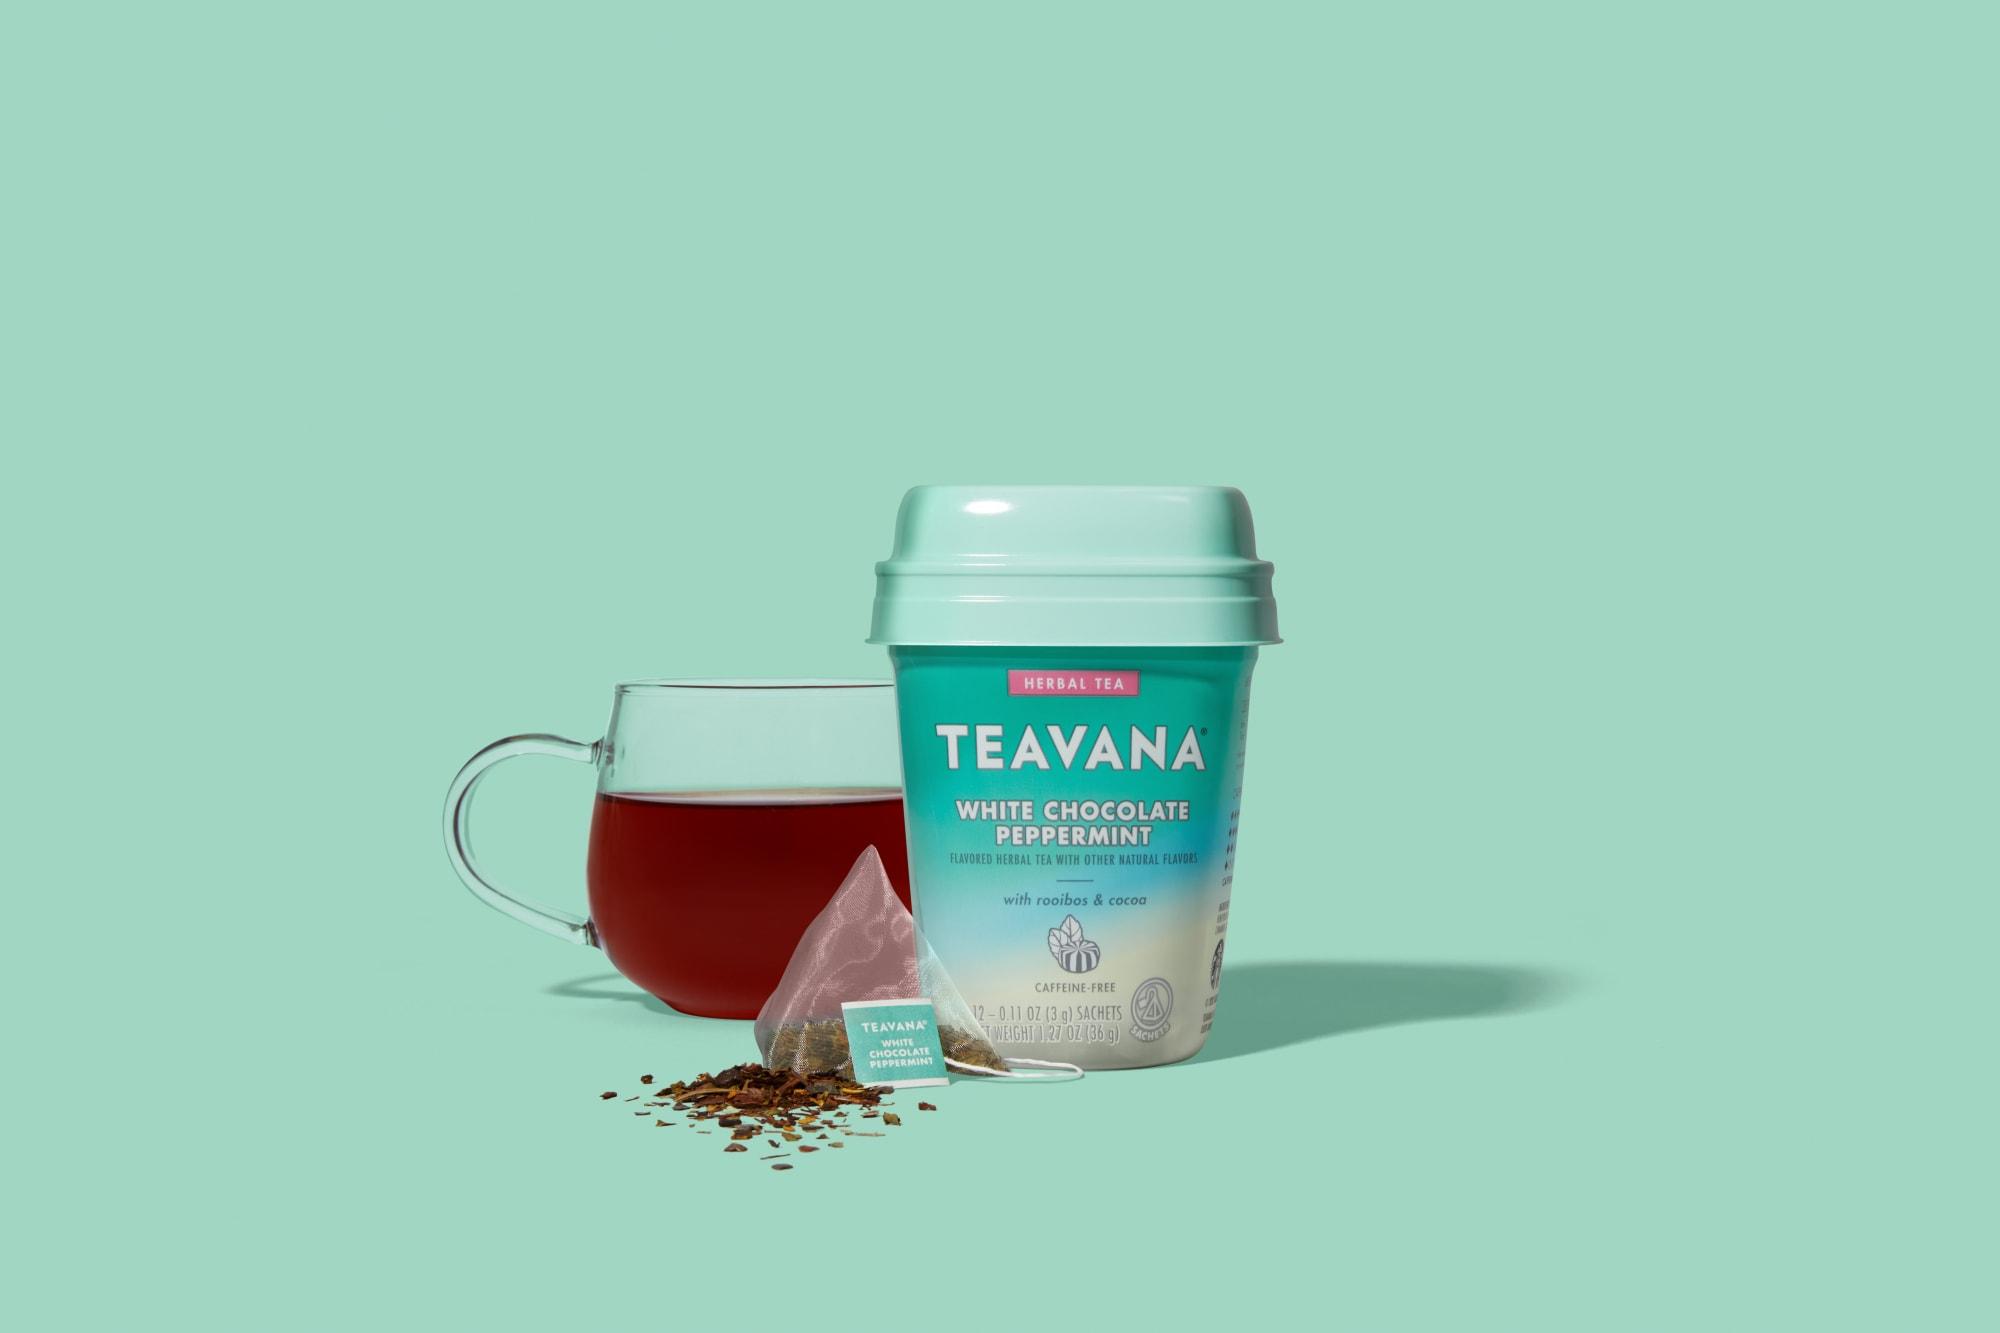 Teavana's White Chocolate Peppermint tea celebrates the holidays everyday